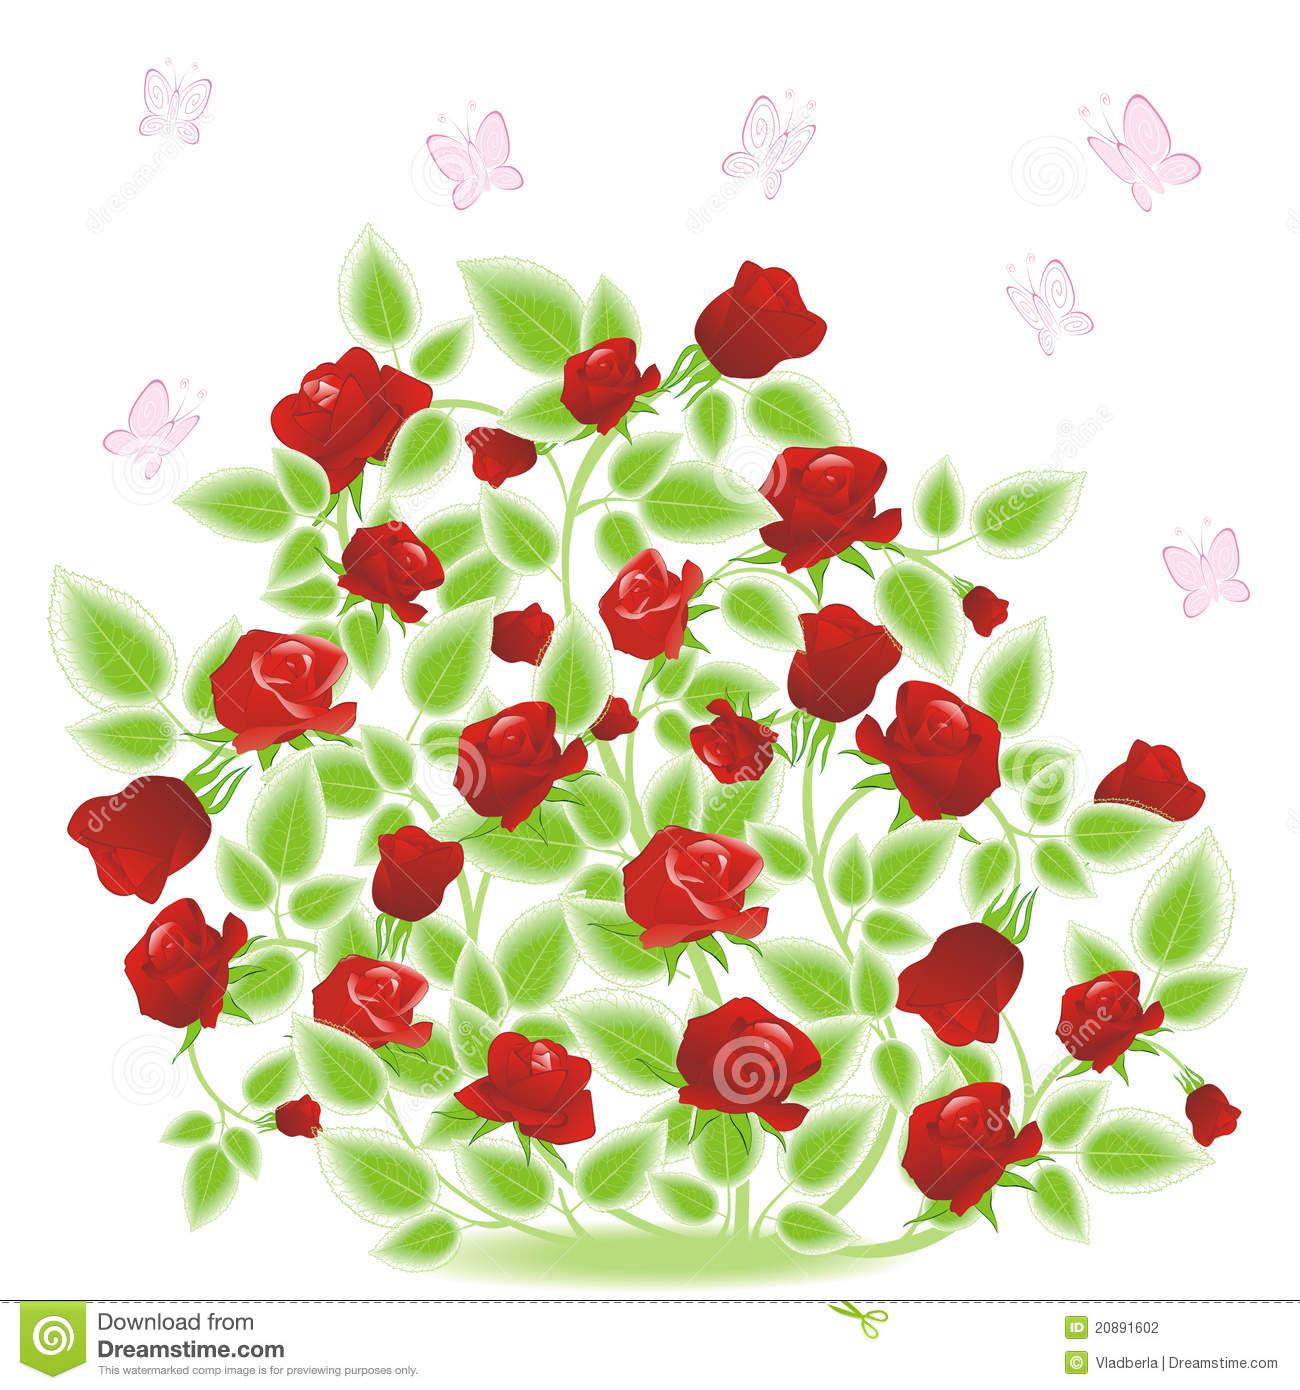 Chic and creative bush. Bushes clipart raspberry